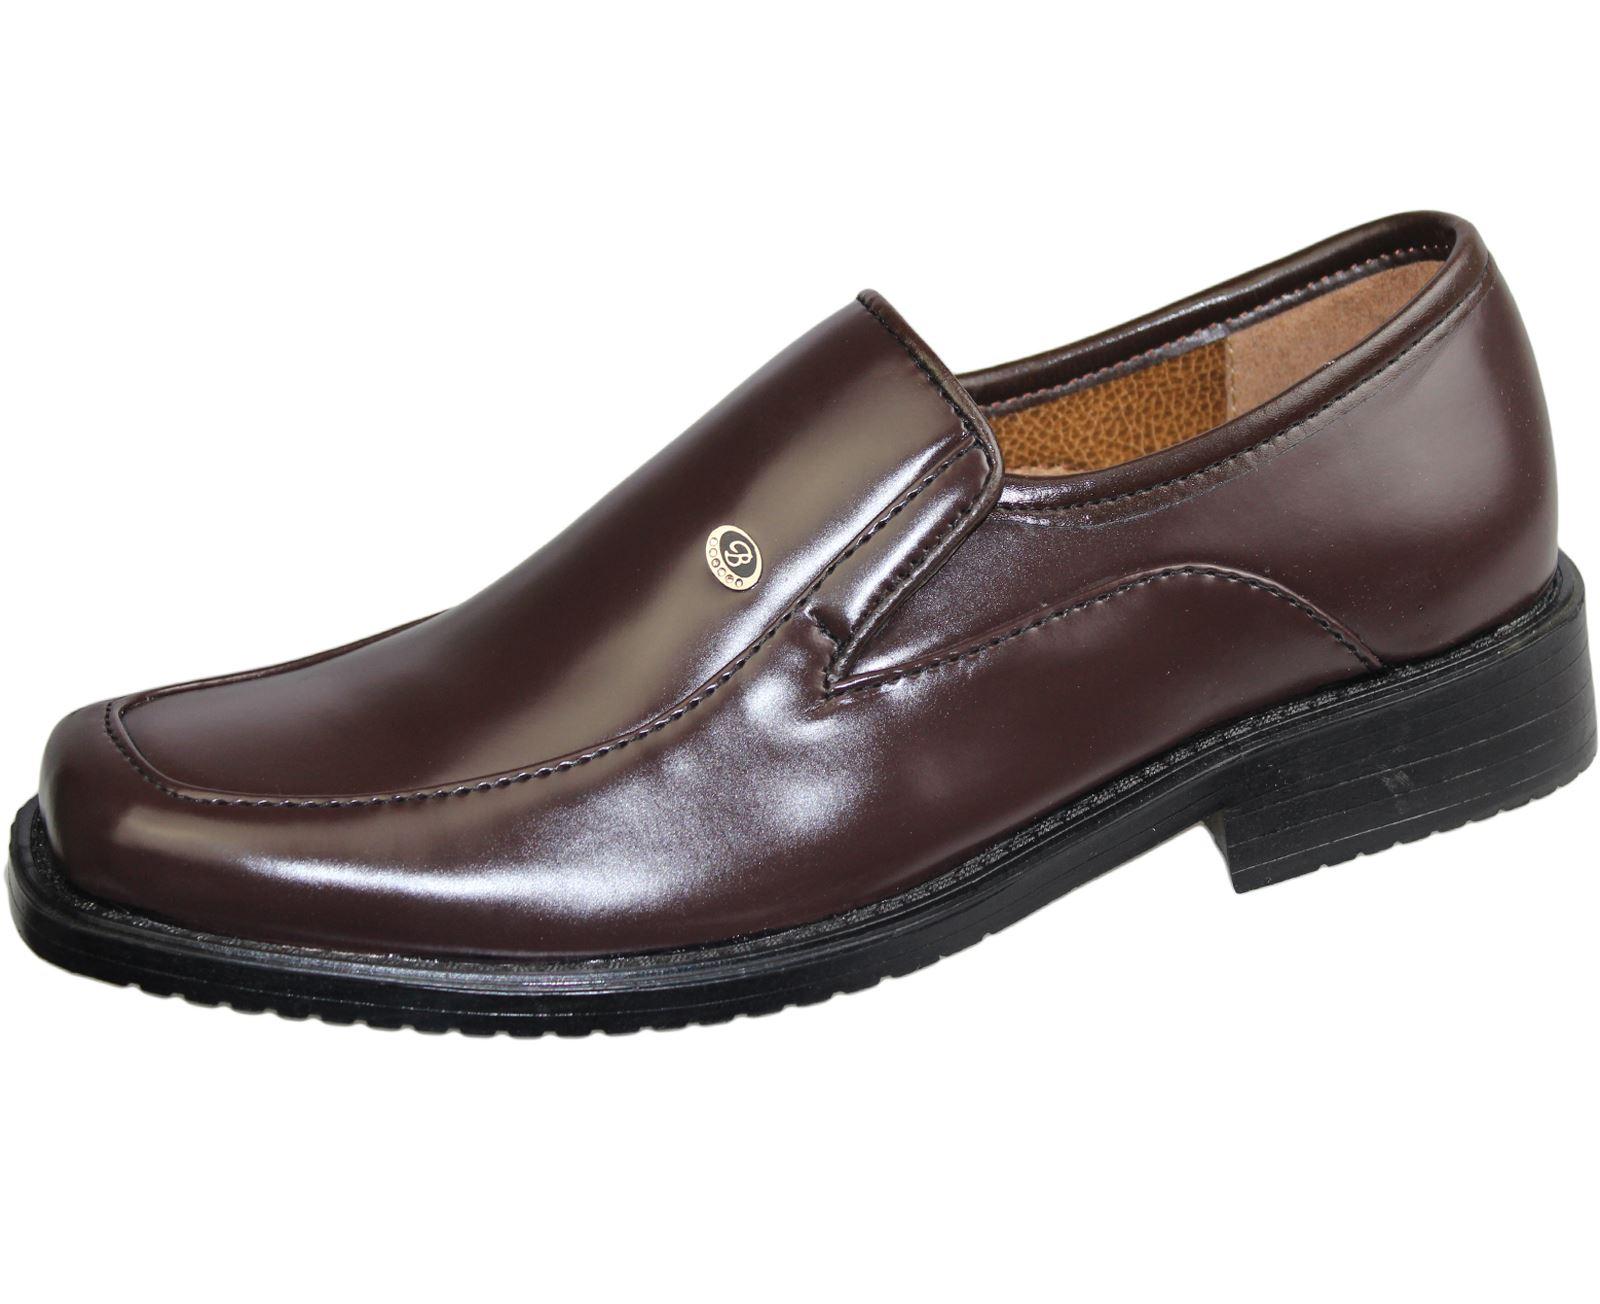 Casual Wedding Shoes 029 - Casual Wedding Shoes